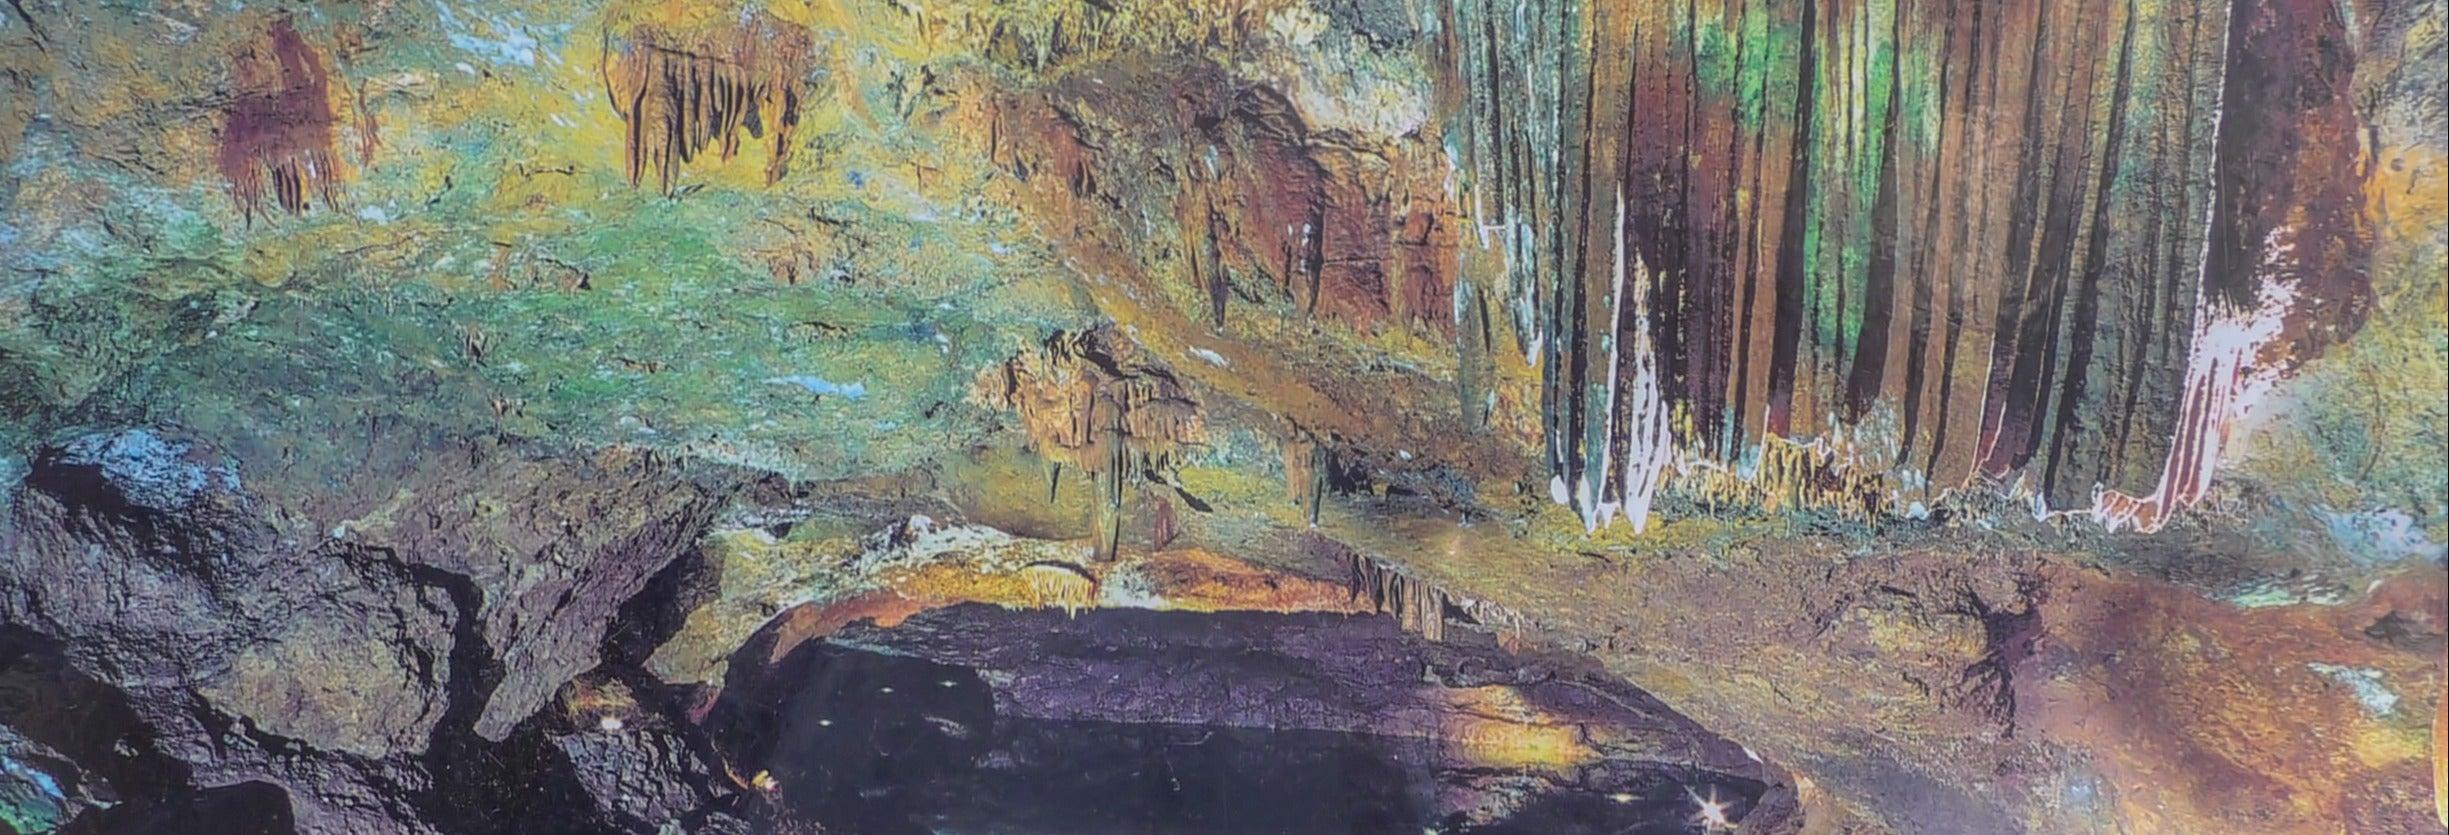 Valencia Caves Day Trip